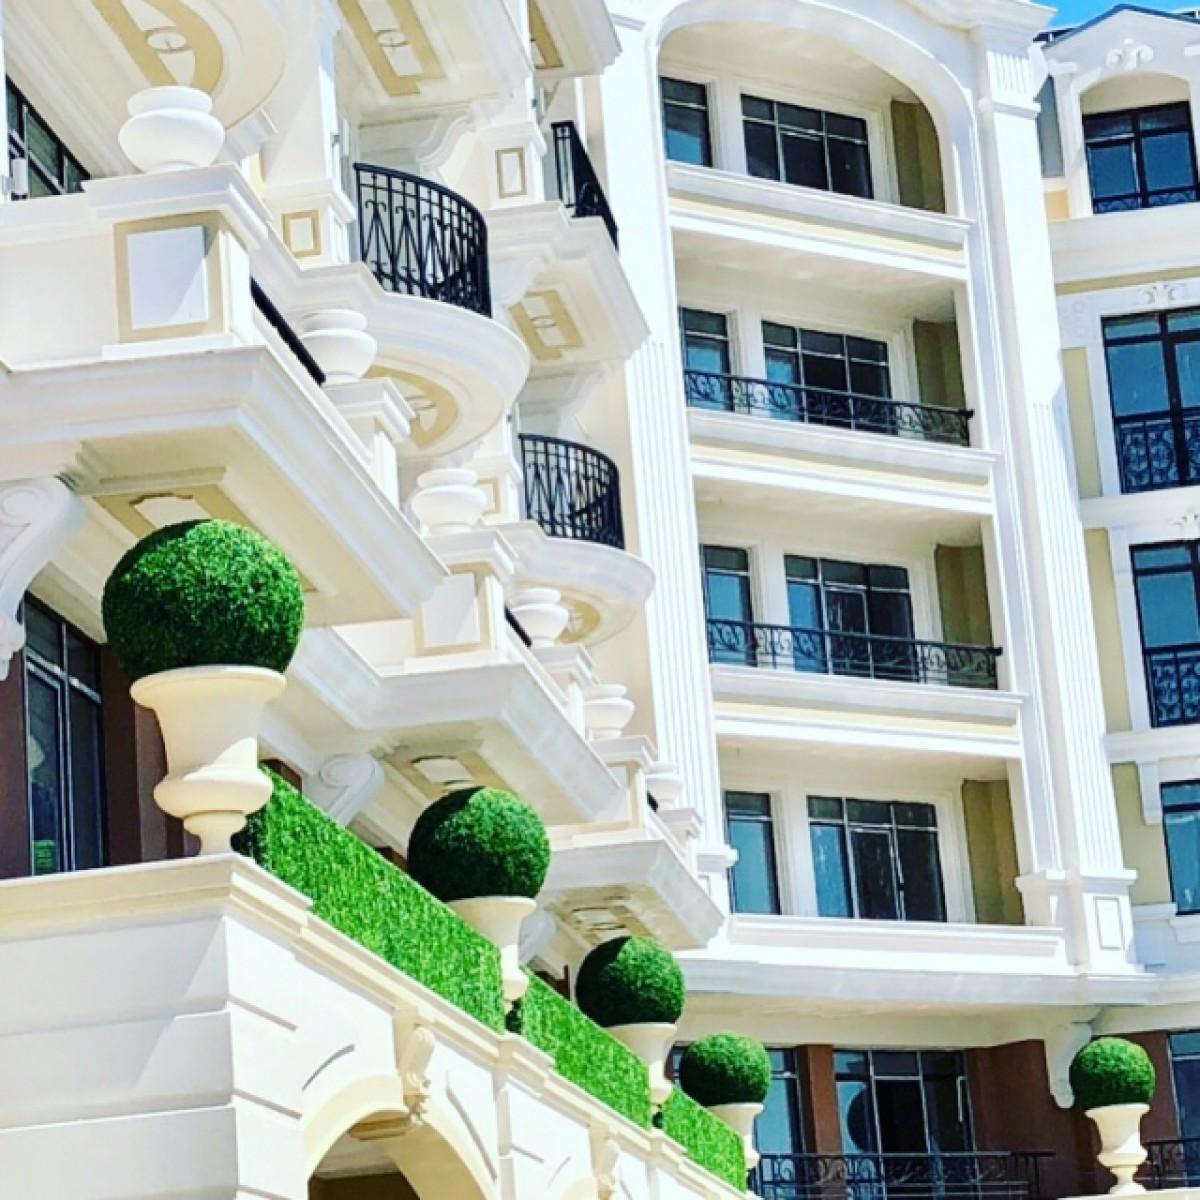 Тристайни апартаменти в Романс Париж комплекс Свети Влас България